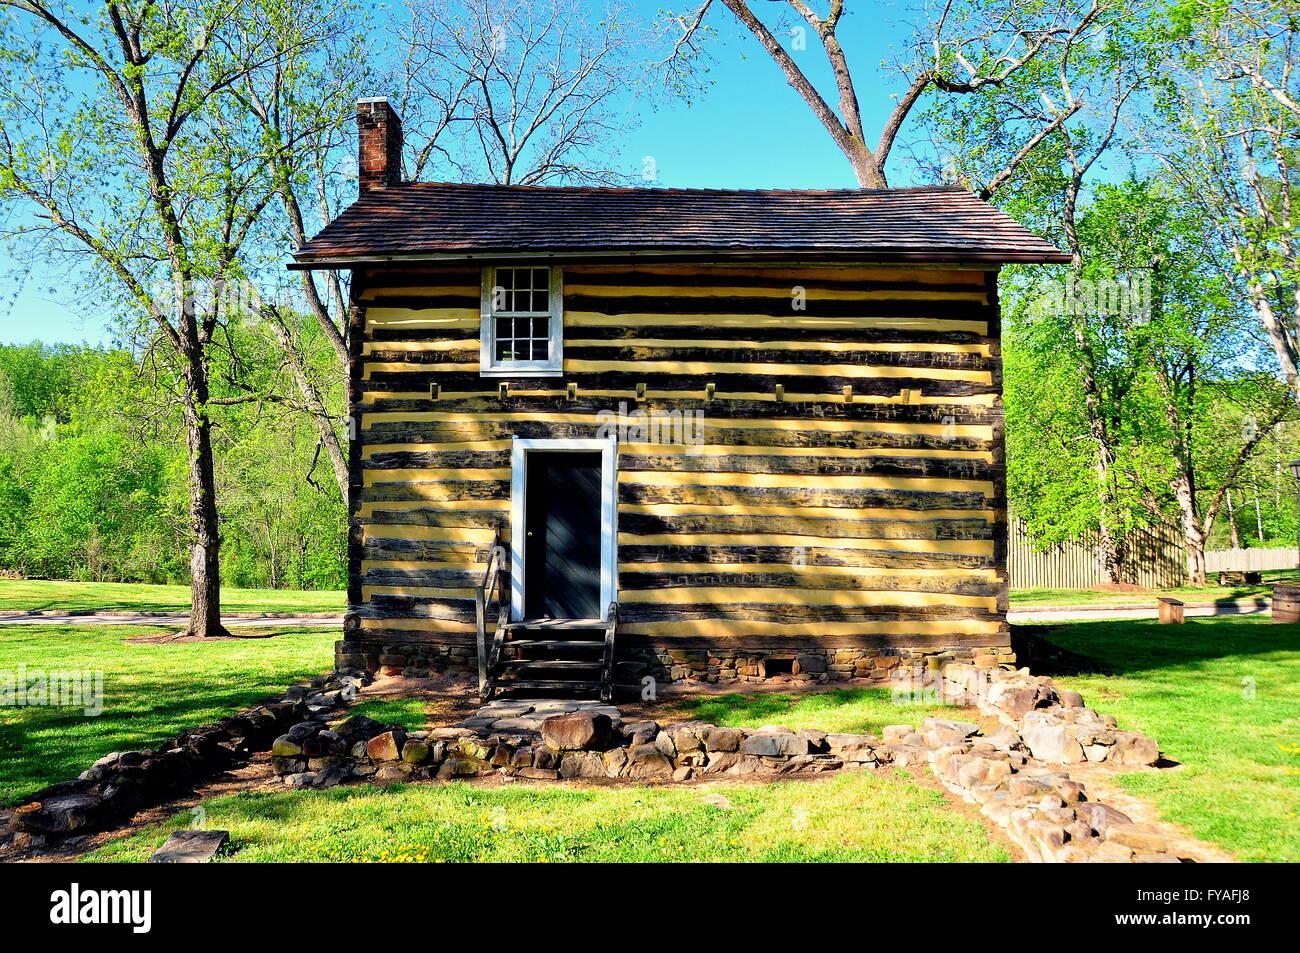 Bethabara, North Carolina:  18th century fachwerk cabin at the Bethabara Moravian settlement historic site * - Stock Image